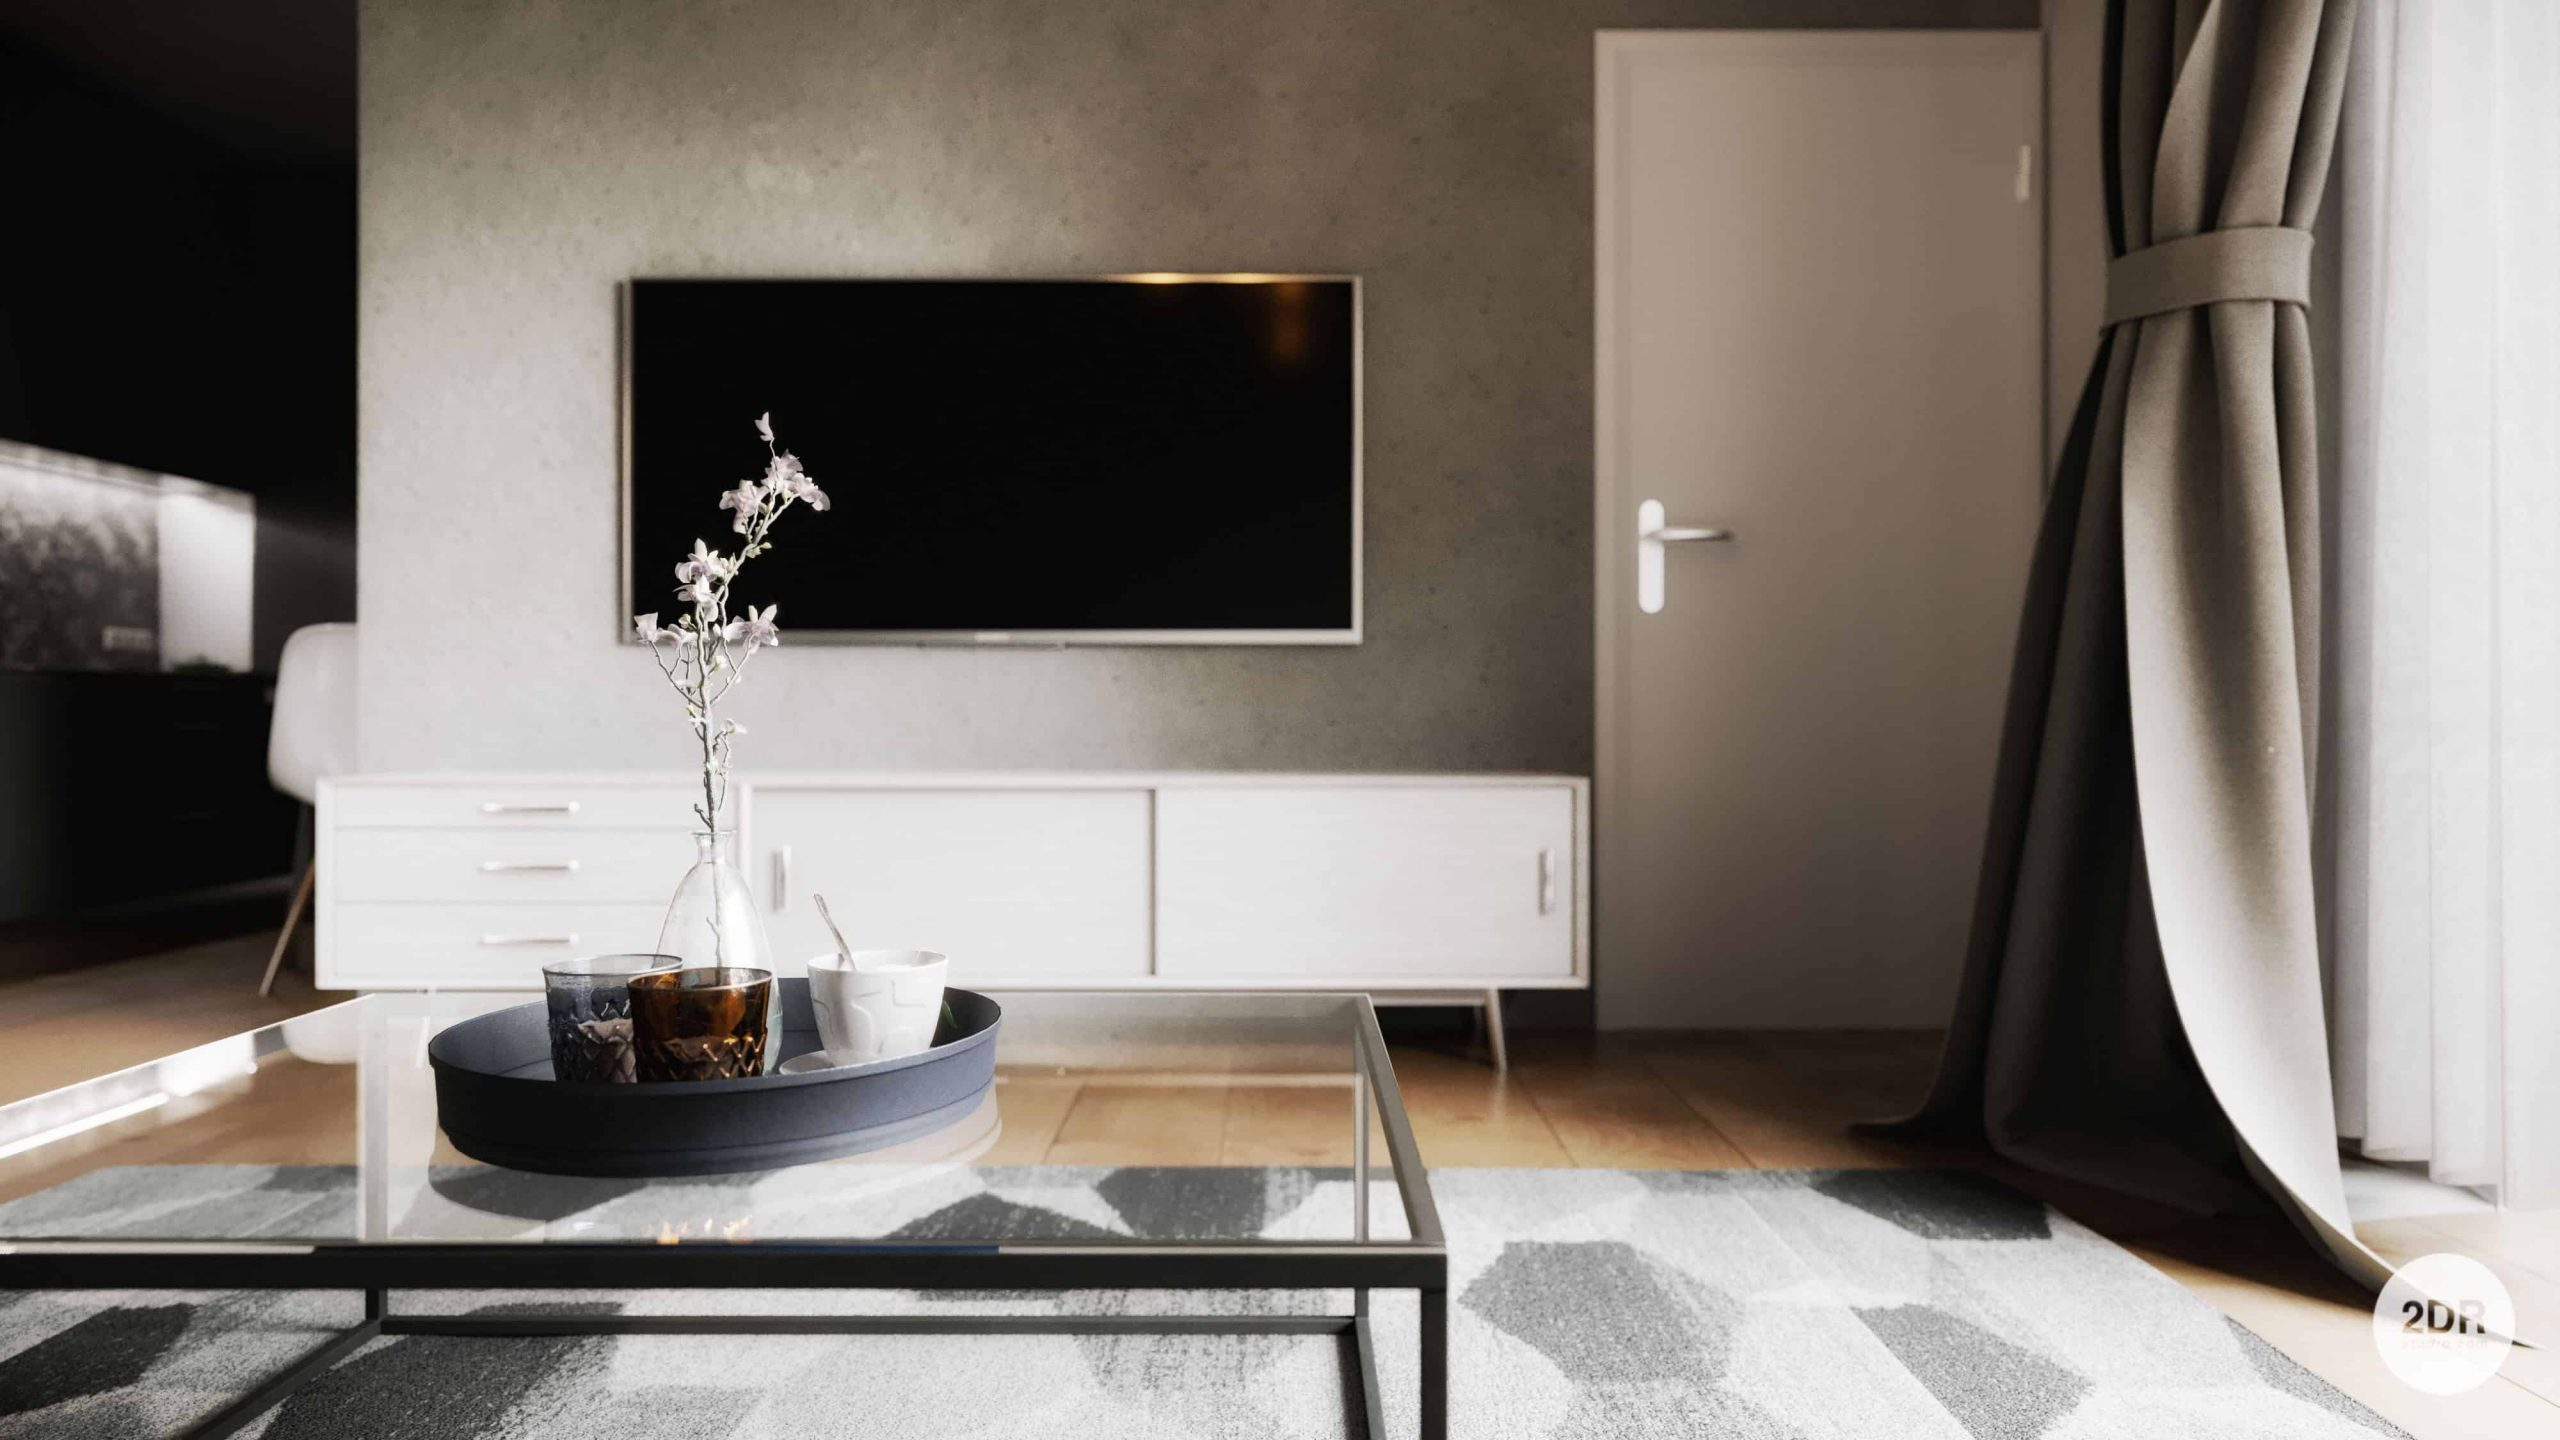 detail-obyvaci-pokoj-bytove-domy-budova-interier-plzen-architektonicka-vizualizace